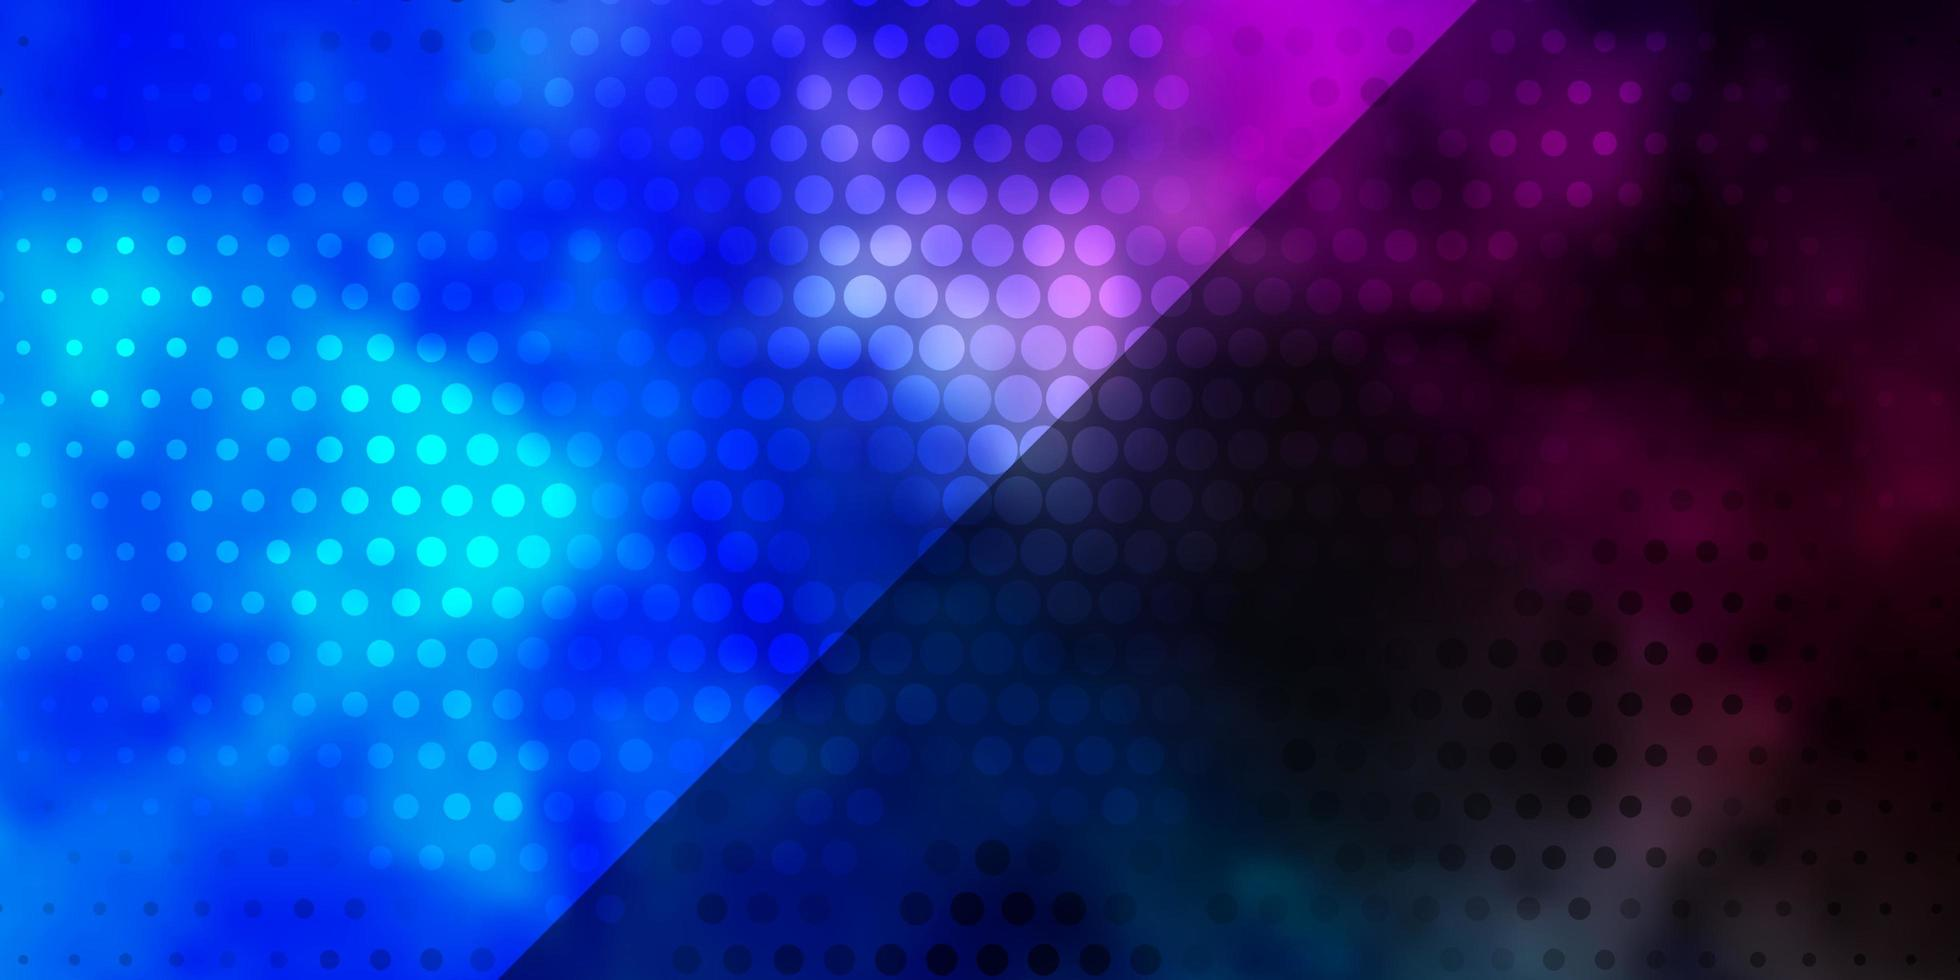 dunkelrosa, blaues Vektormuster mit Kreisen. vektor